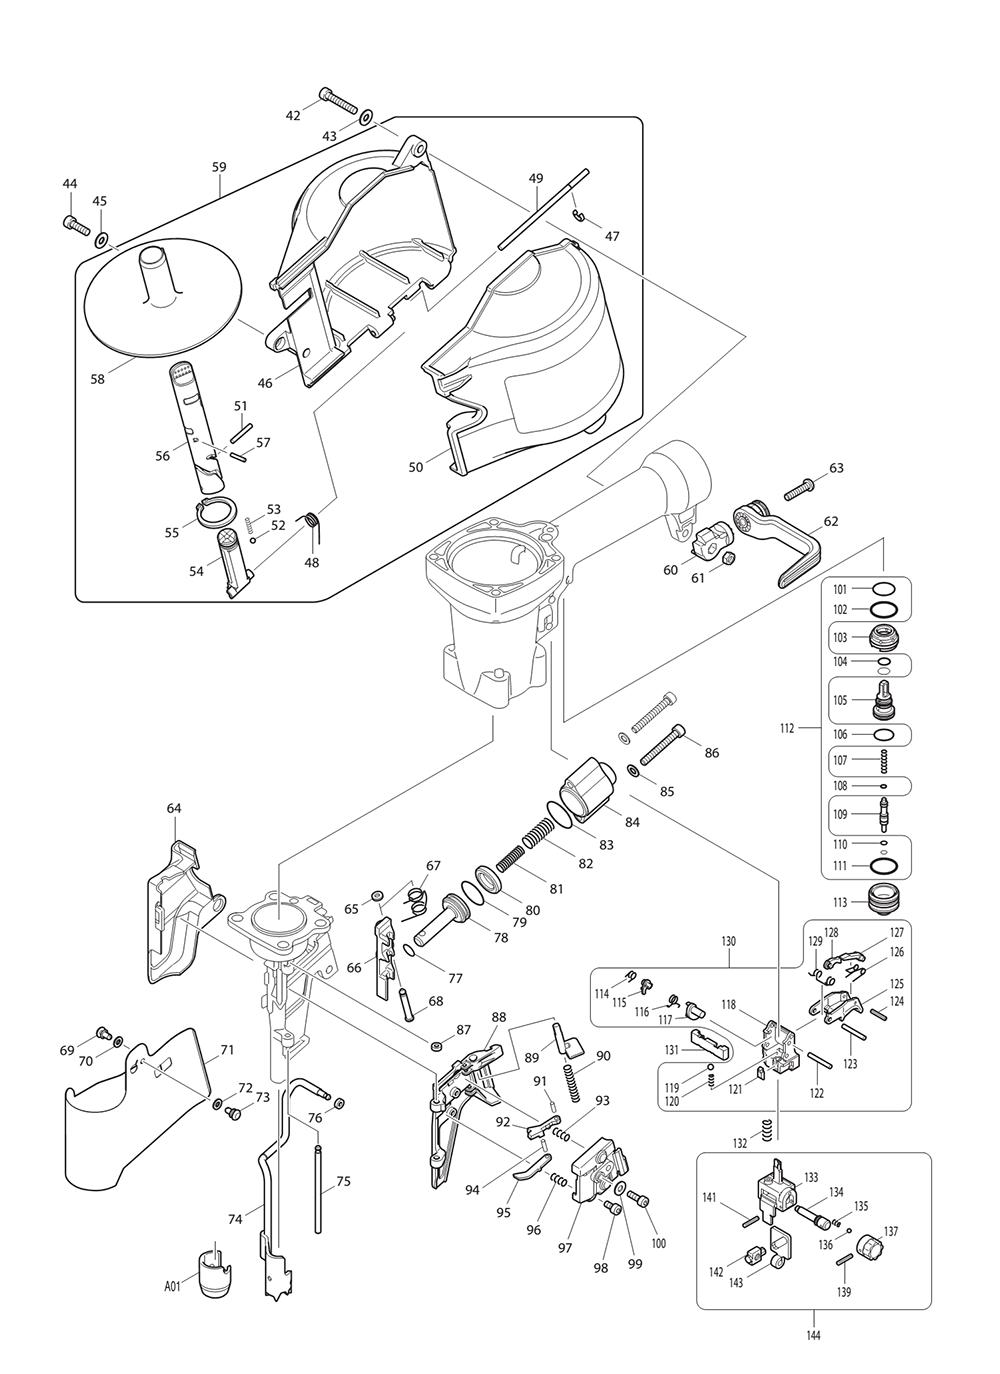 AN911H-T2-Makita-PB-1Break Down